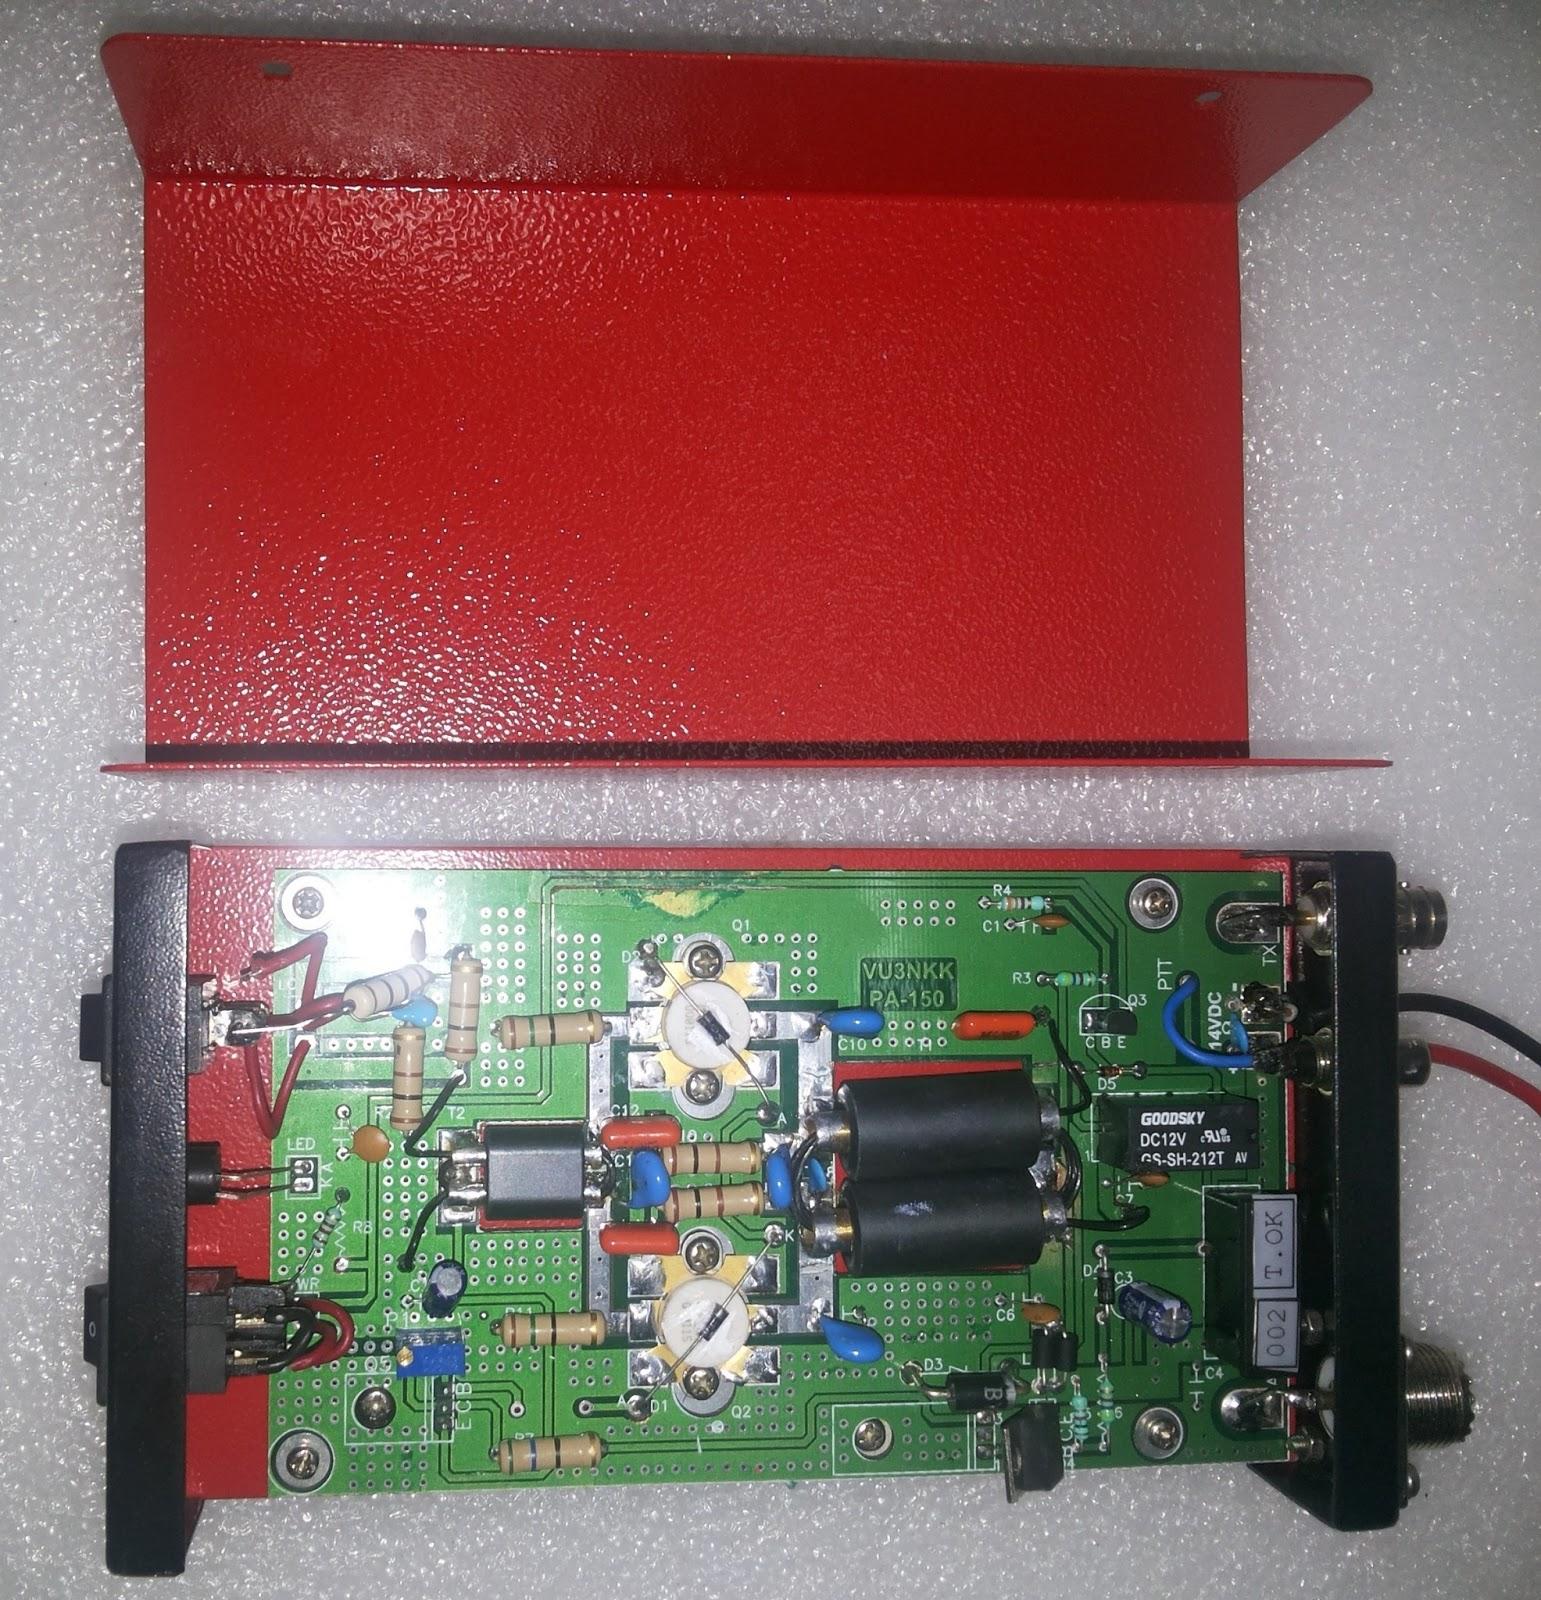 Home Brew Corner: PA150 HF LINEAR 200W Amplifier on hi fi amplifier, solid state hf amplifier, transistor amplifier, x force base amplifier, 2 meter ham radio amplifier, 4cx250b grounded grid amplifier, homemade amplifier, cobra cb amplifier, fatboy 700 base amplifier,